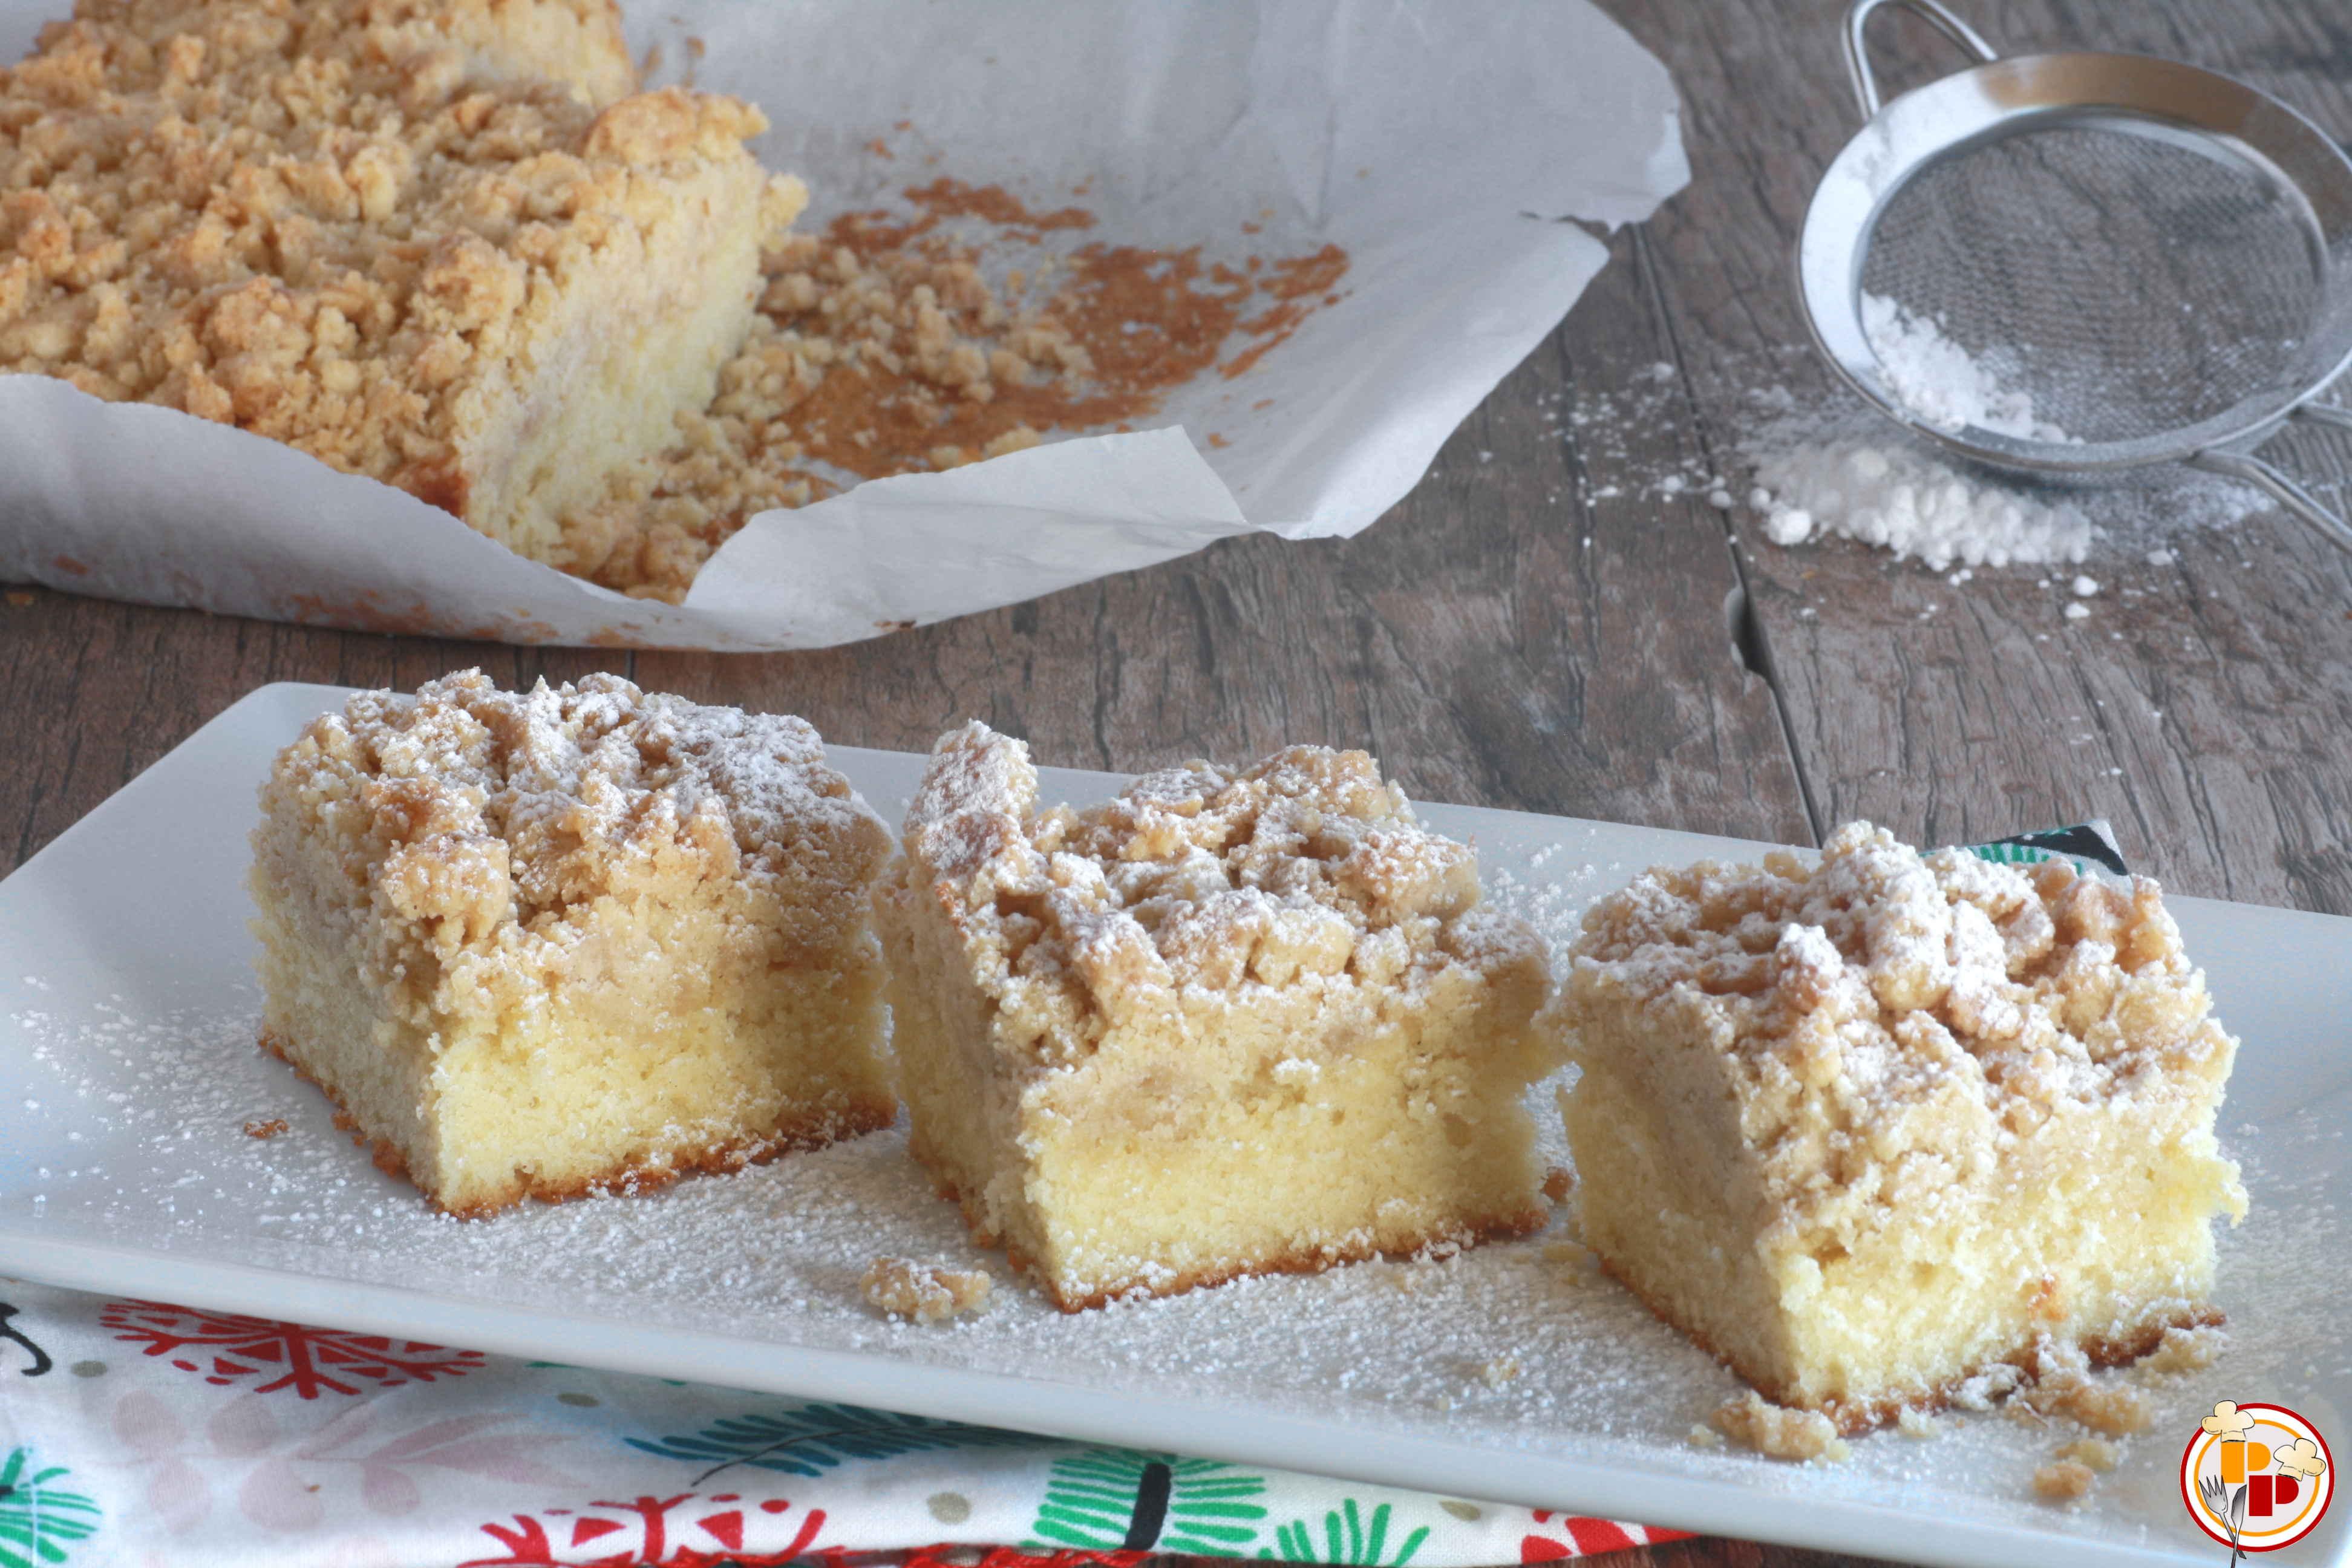 Torta Sbriciolata Americana (New York-Style Crumb Cake)